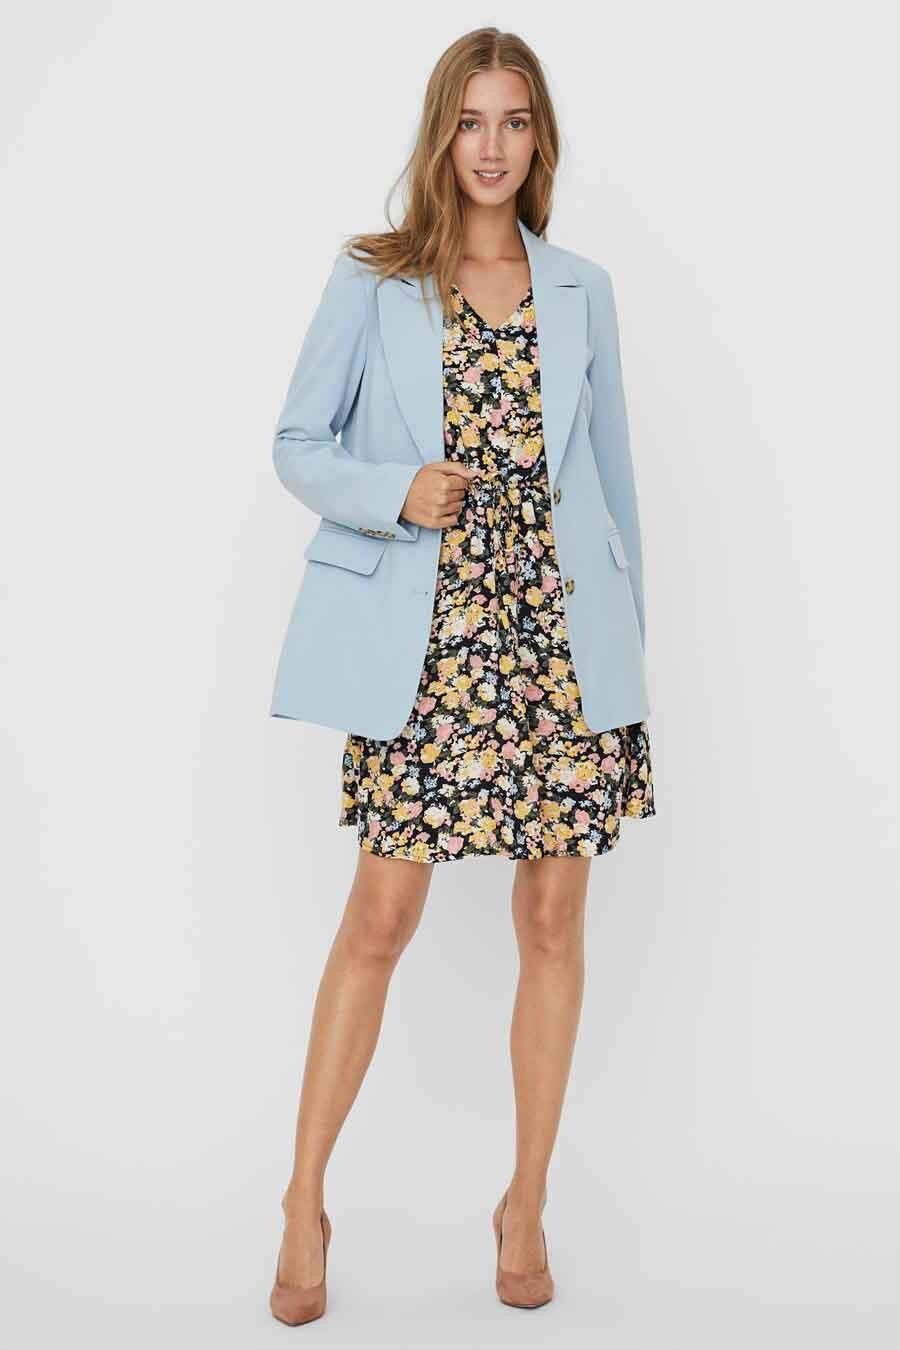 Vero Moda® Blazer, Blauw, Dames, Maat: 34